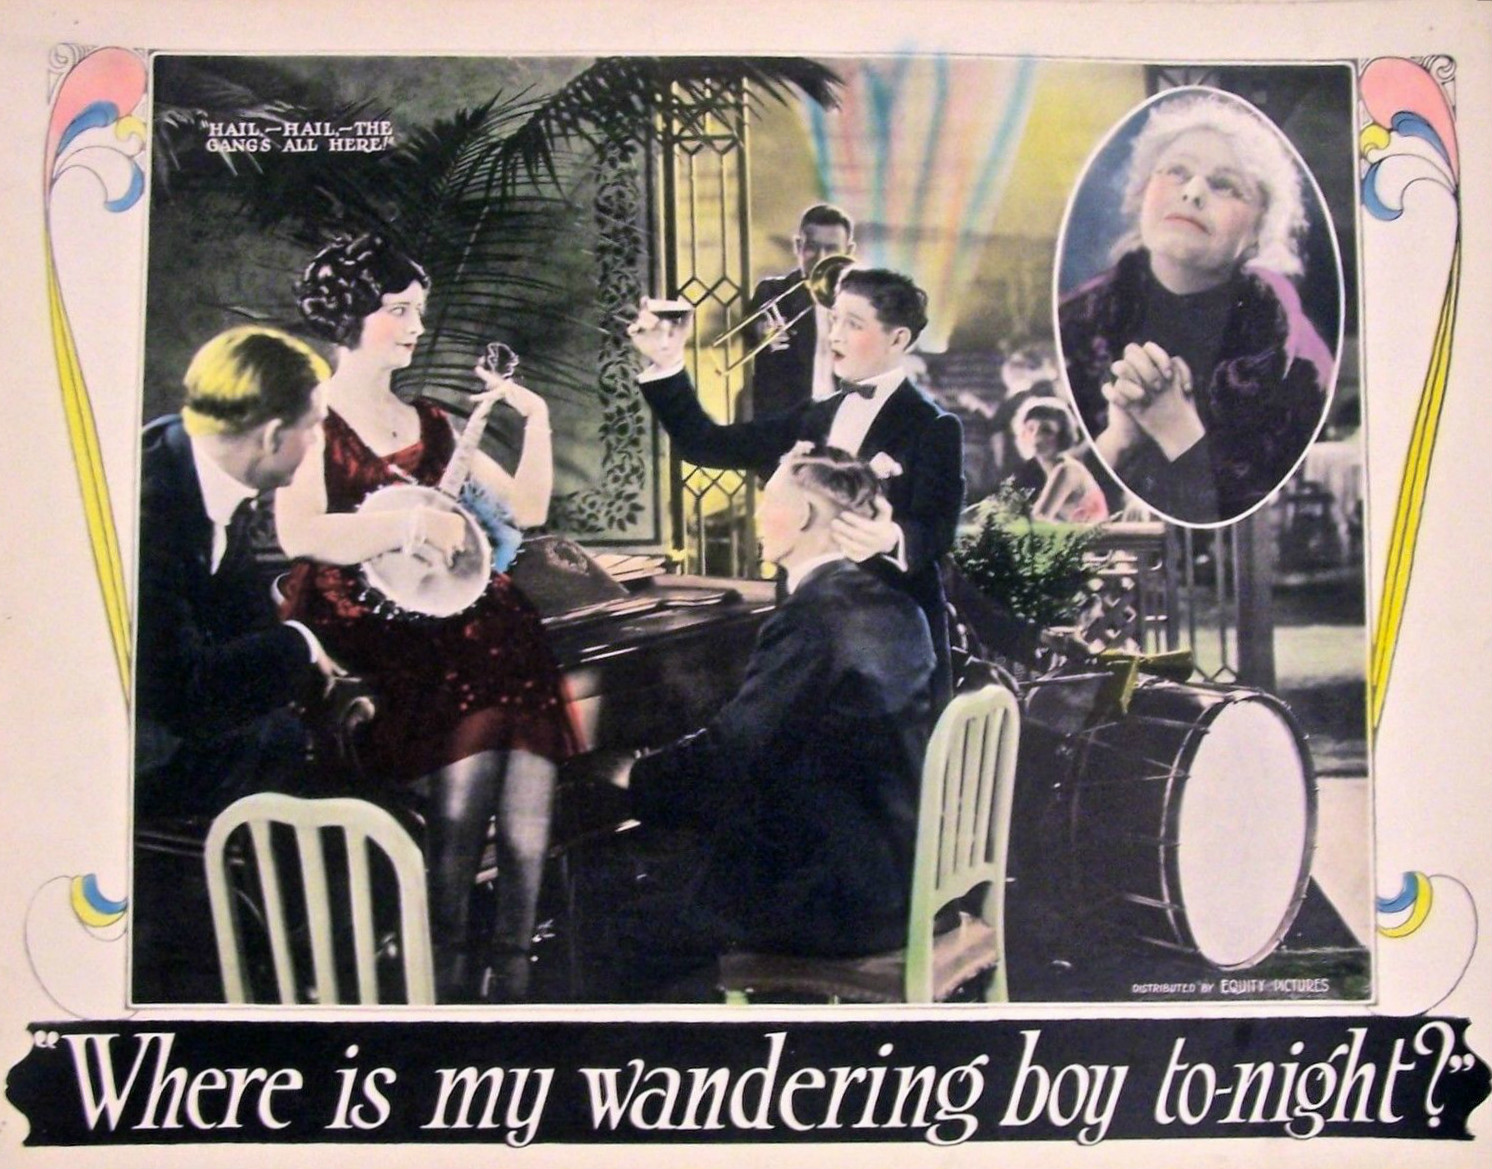 Where_Is_My_Wandering_Boy_Tonight_lobby_